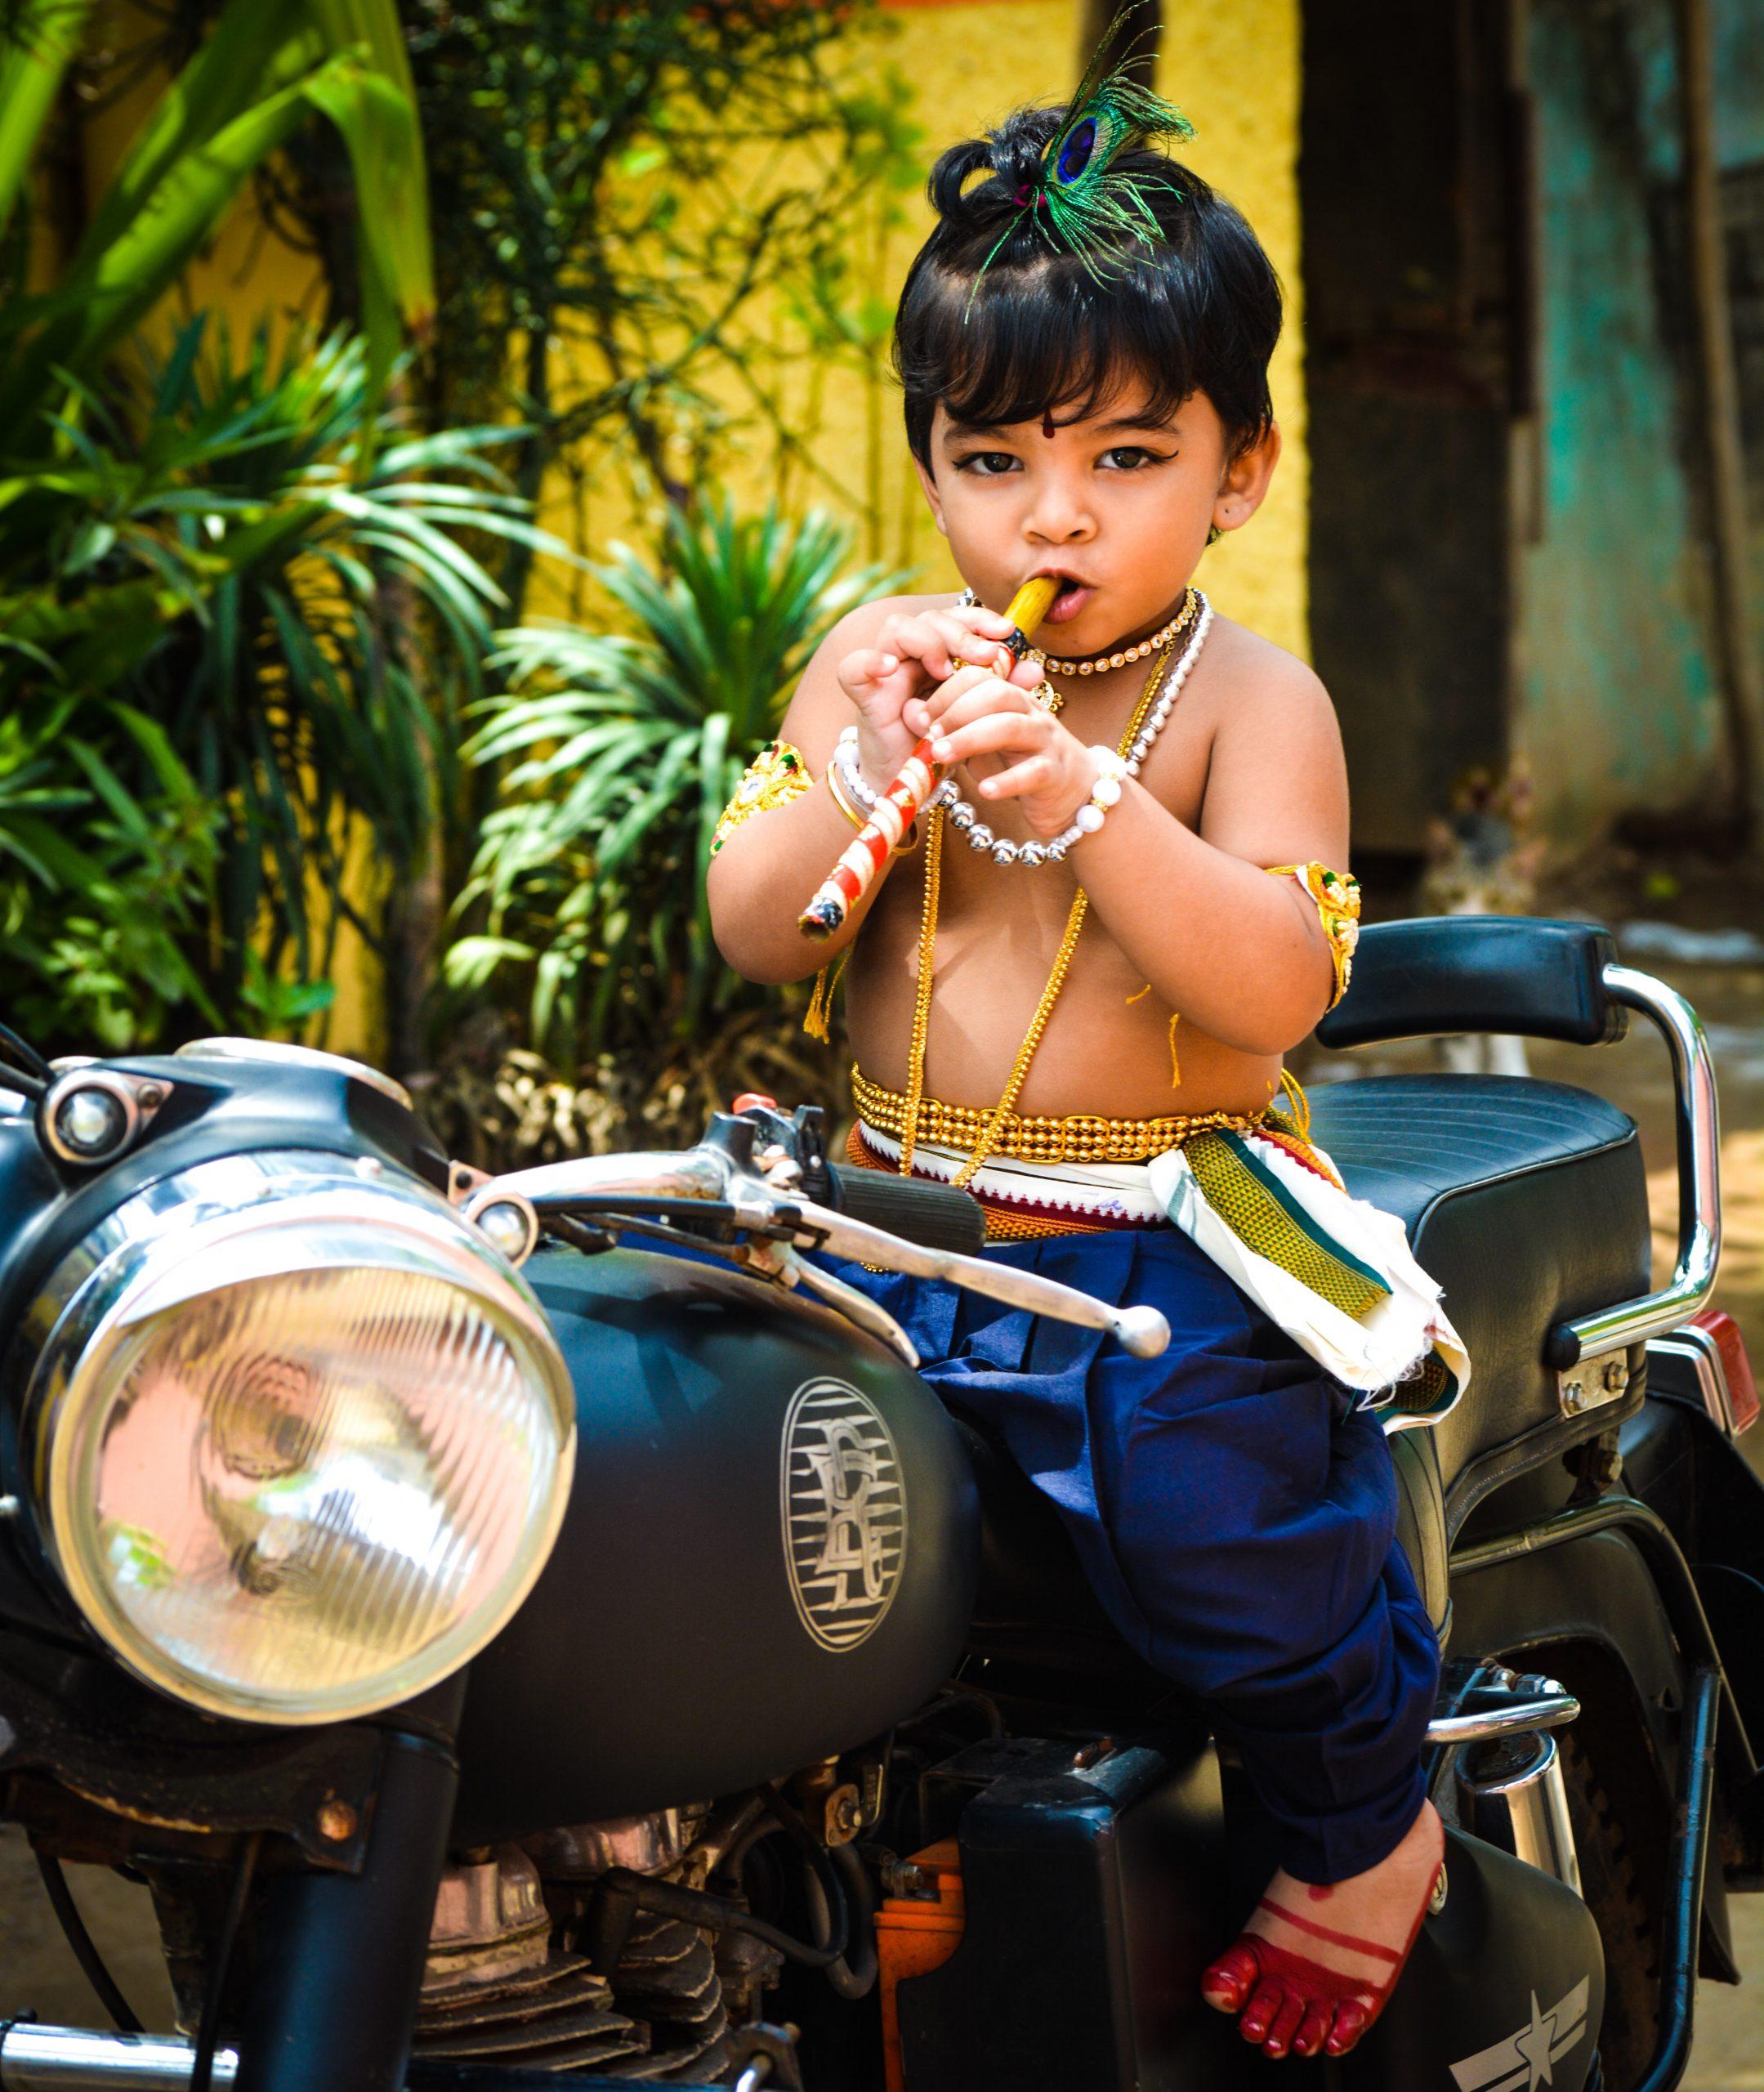 Little baby in Krishna Avtar on Royal Enfield bike